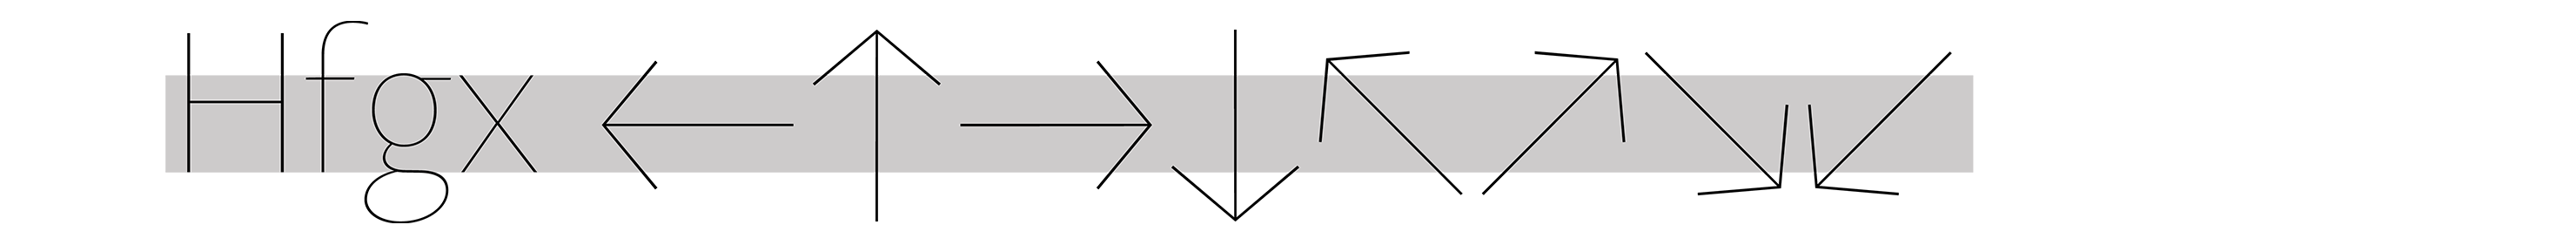 Typeface-Novel-Sans-Hairline-F22-Atlas-Font-Foundry